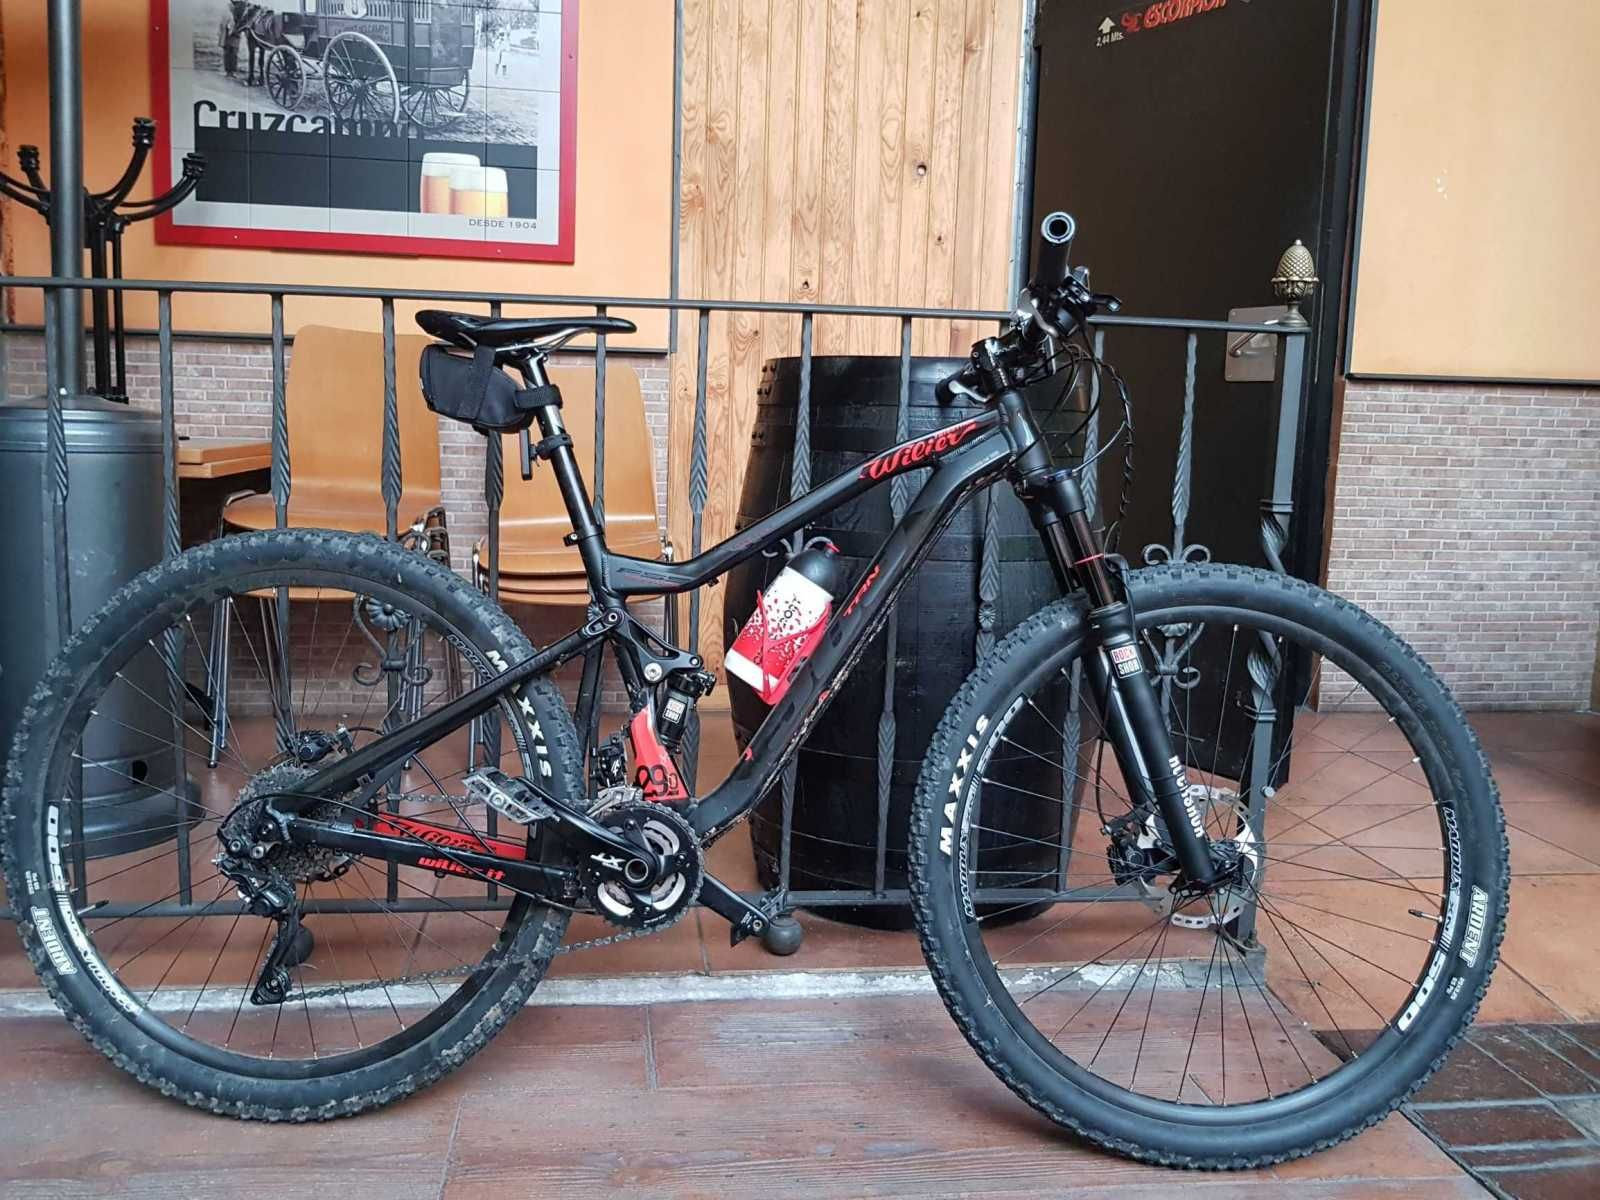 Bicicleta De Montaña Wilier Fs 903 Trn 29 Ref 45832 Talla M Año 2016 Cambio Shimano Deore Xt Cuadro De Alumini Bicicletas Bicicletas Mtb Cambios Shimano